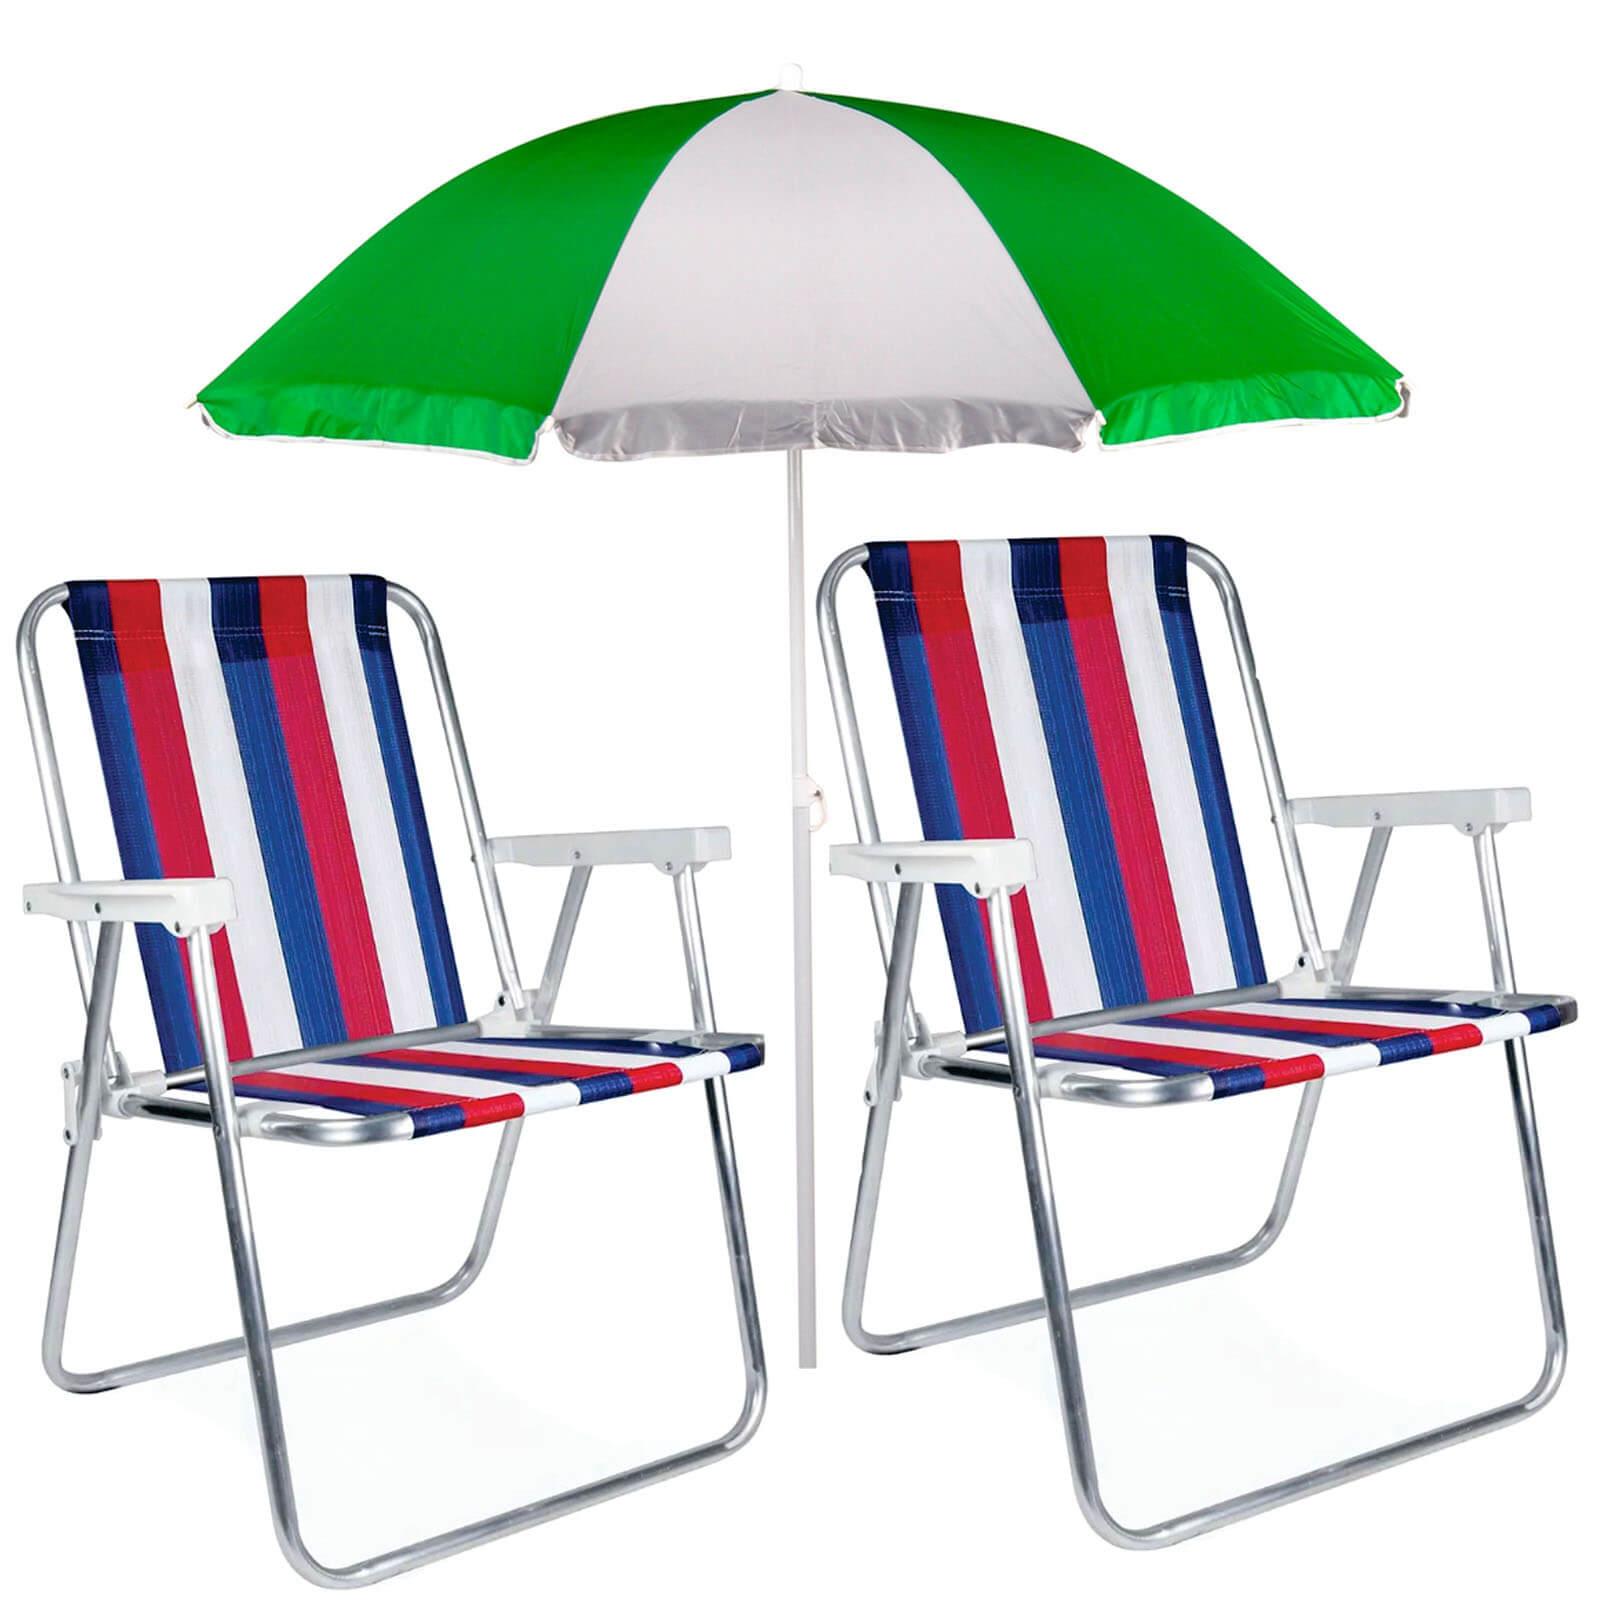 Kit Praia 2 Cadeiras Alta Alumínio + Guarda Sol 1,80m Mor